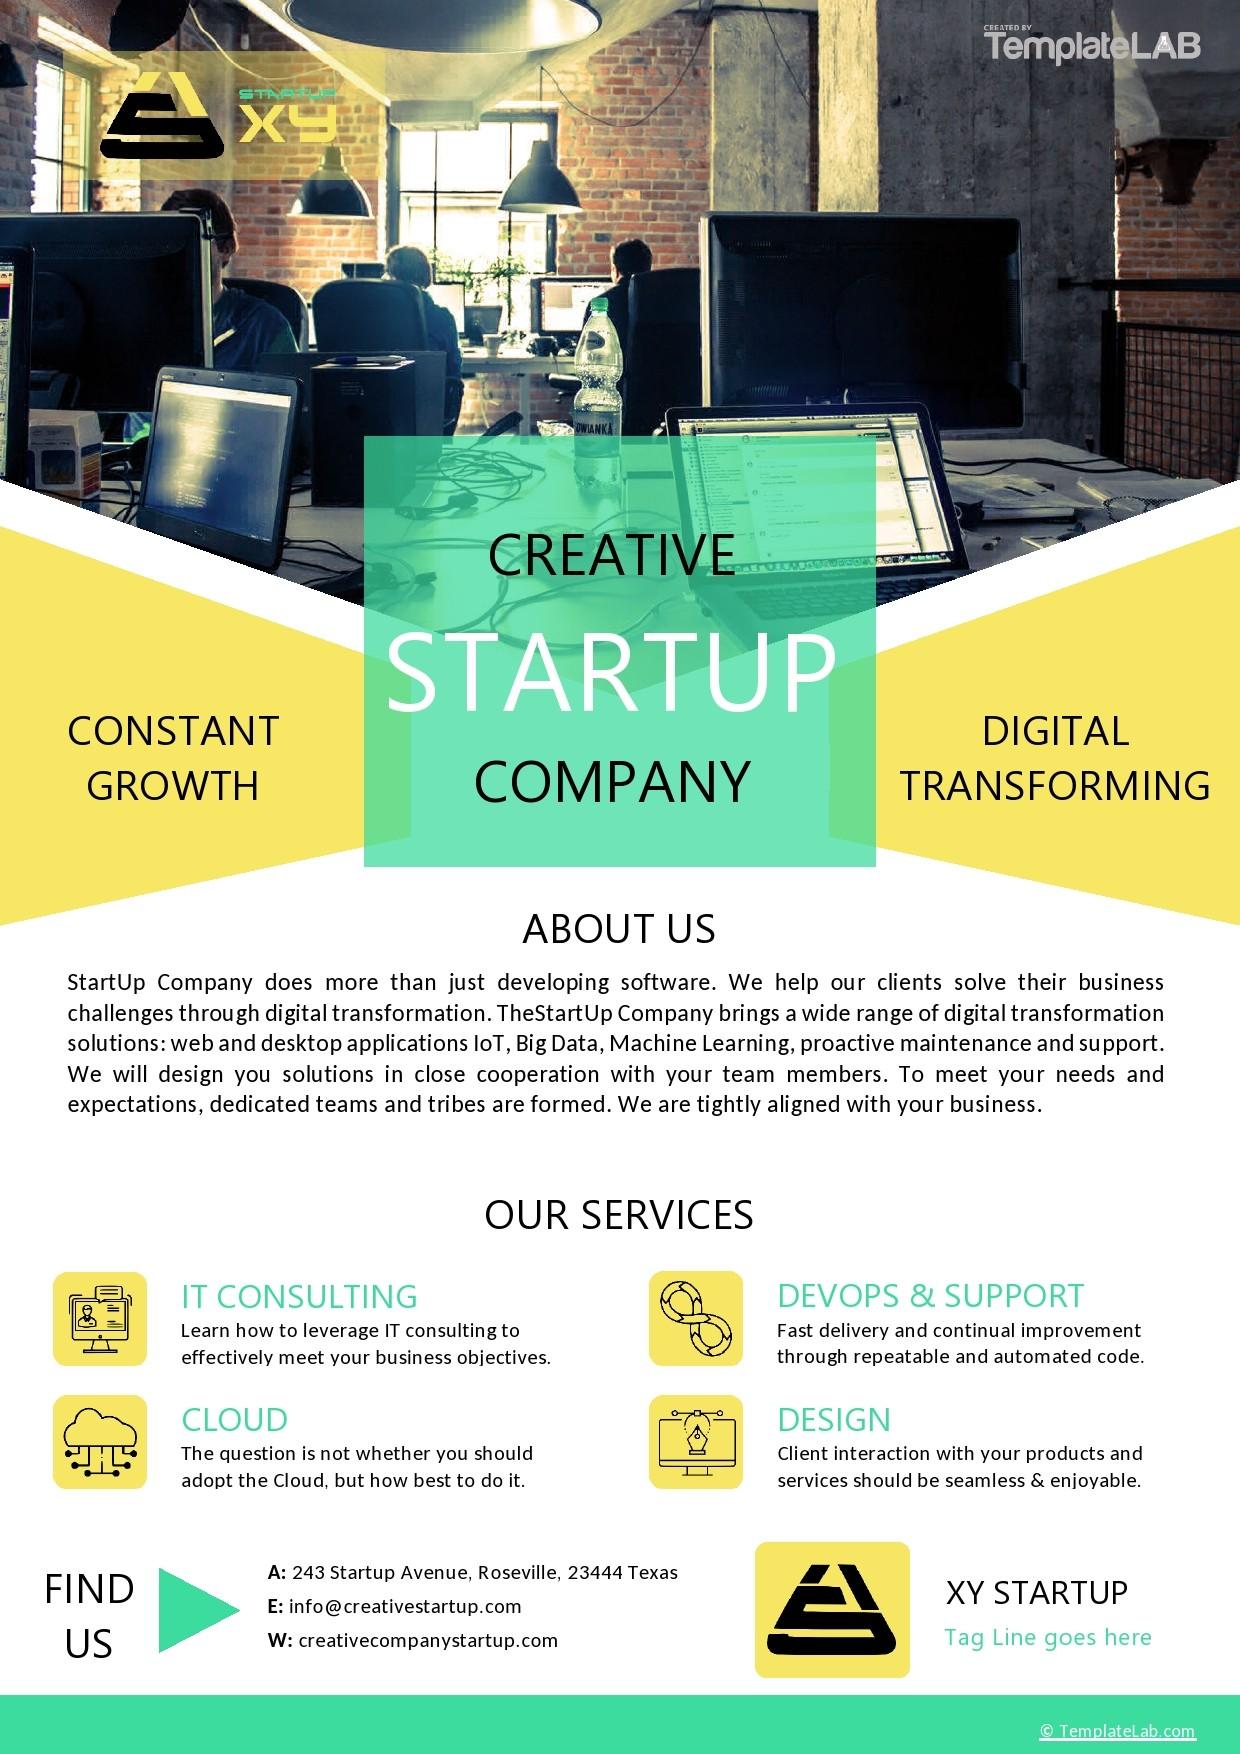 Free Startup Company Profile Template - TemplateLab.com